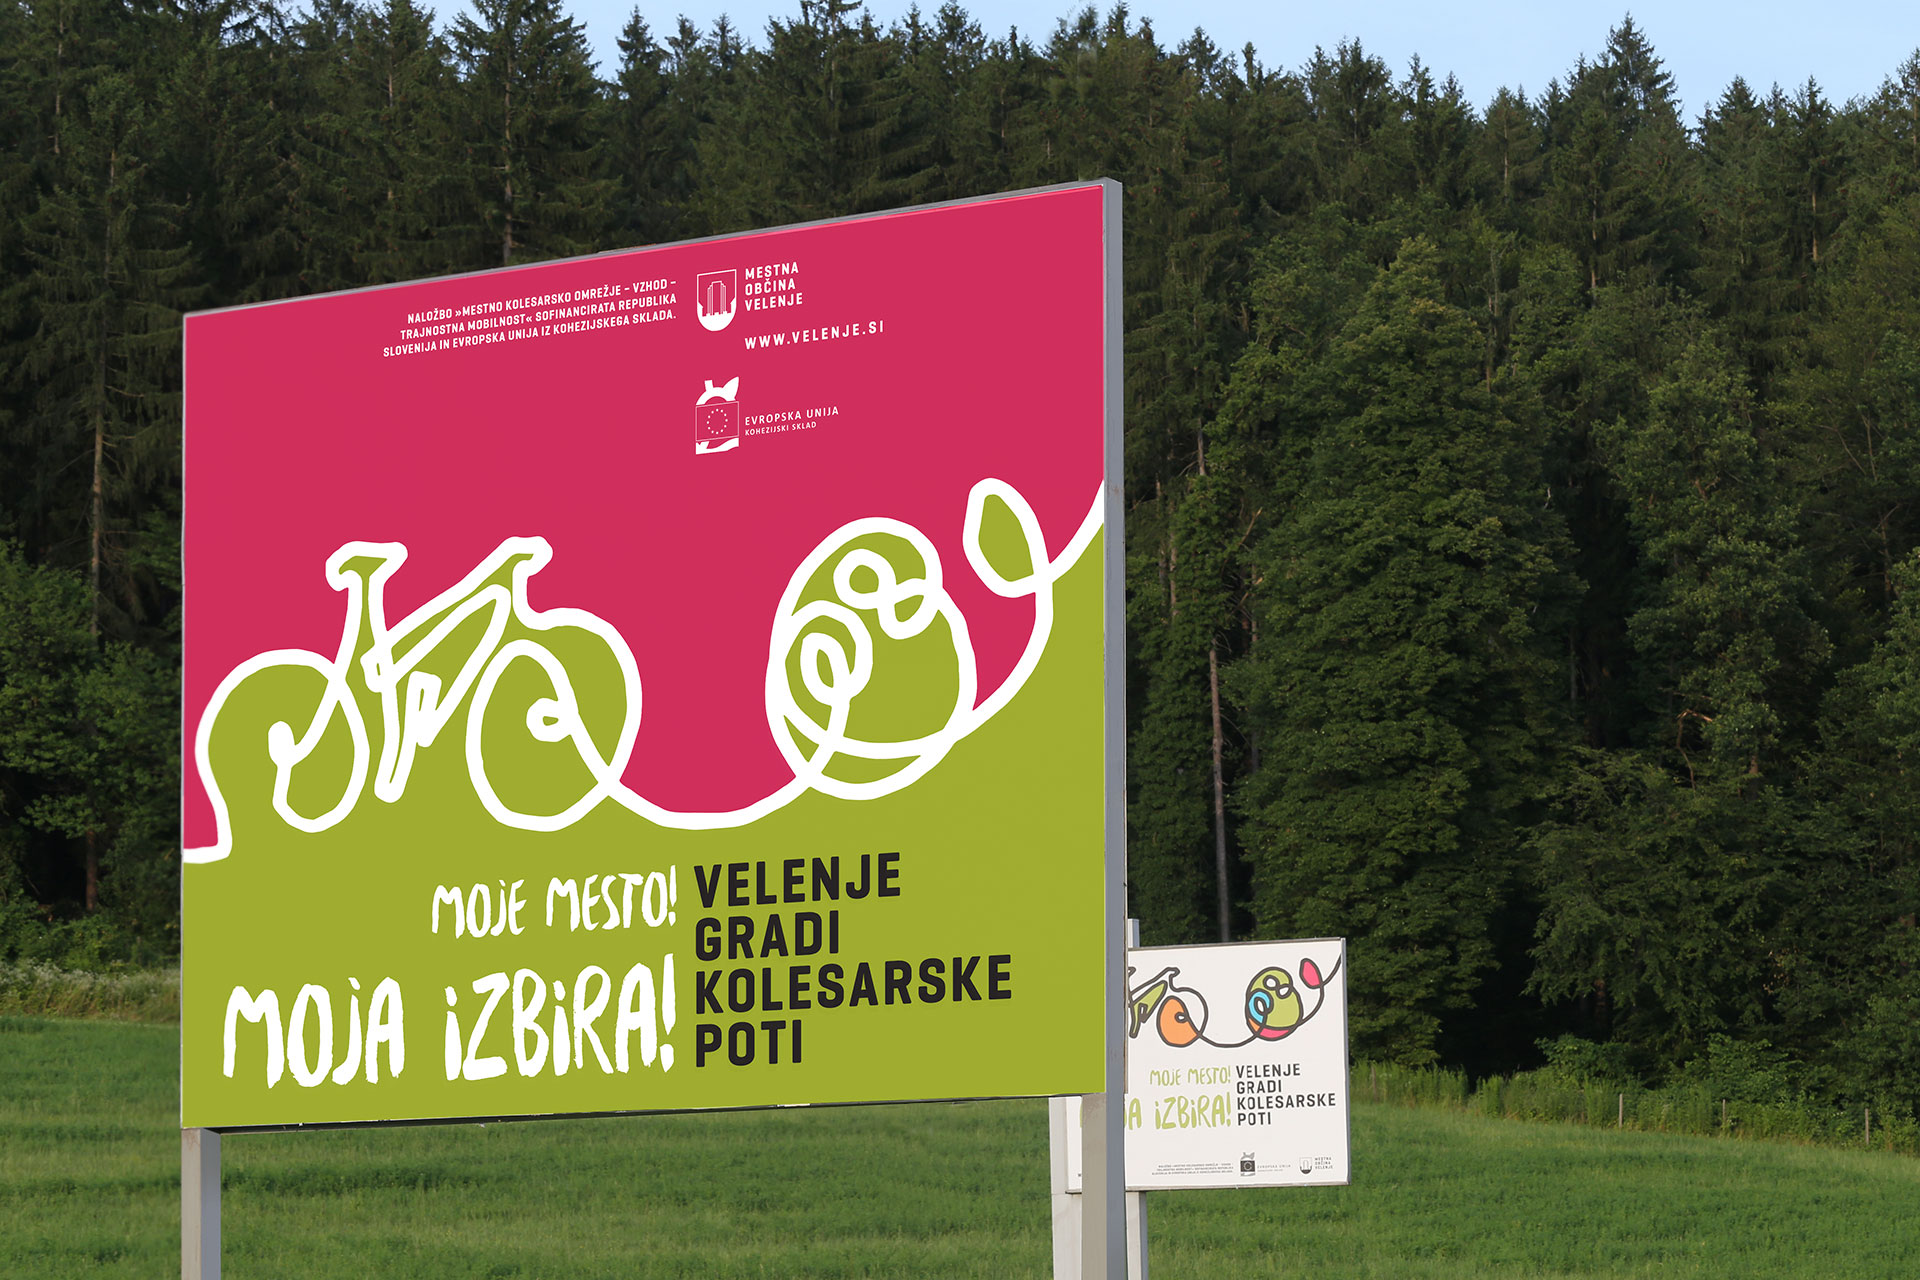 moje_mesto_kolesarske-obcina_velenje-jumbo_vizualna_podoba_marko_marinsek_ma-ma_studio__19_1